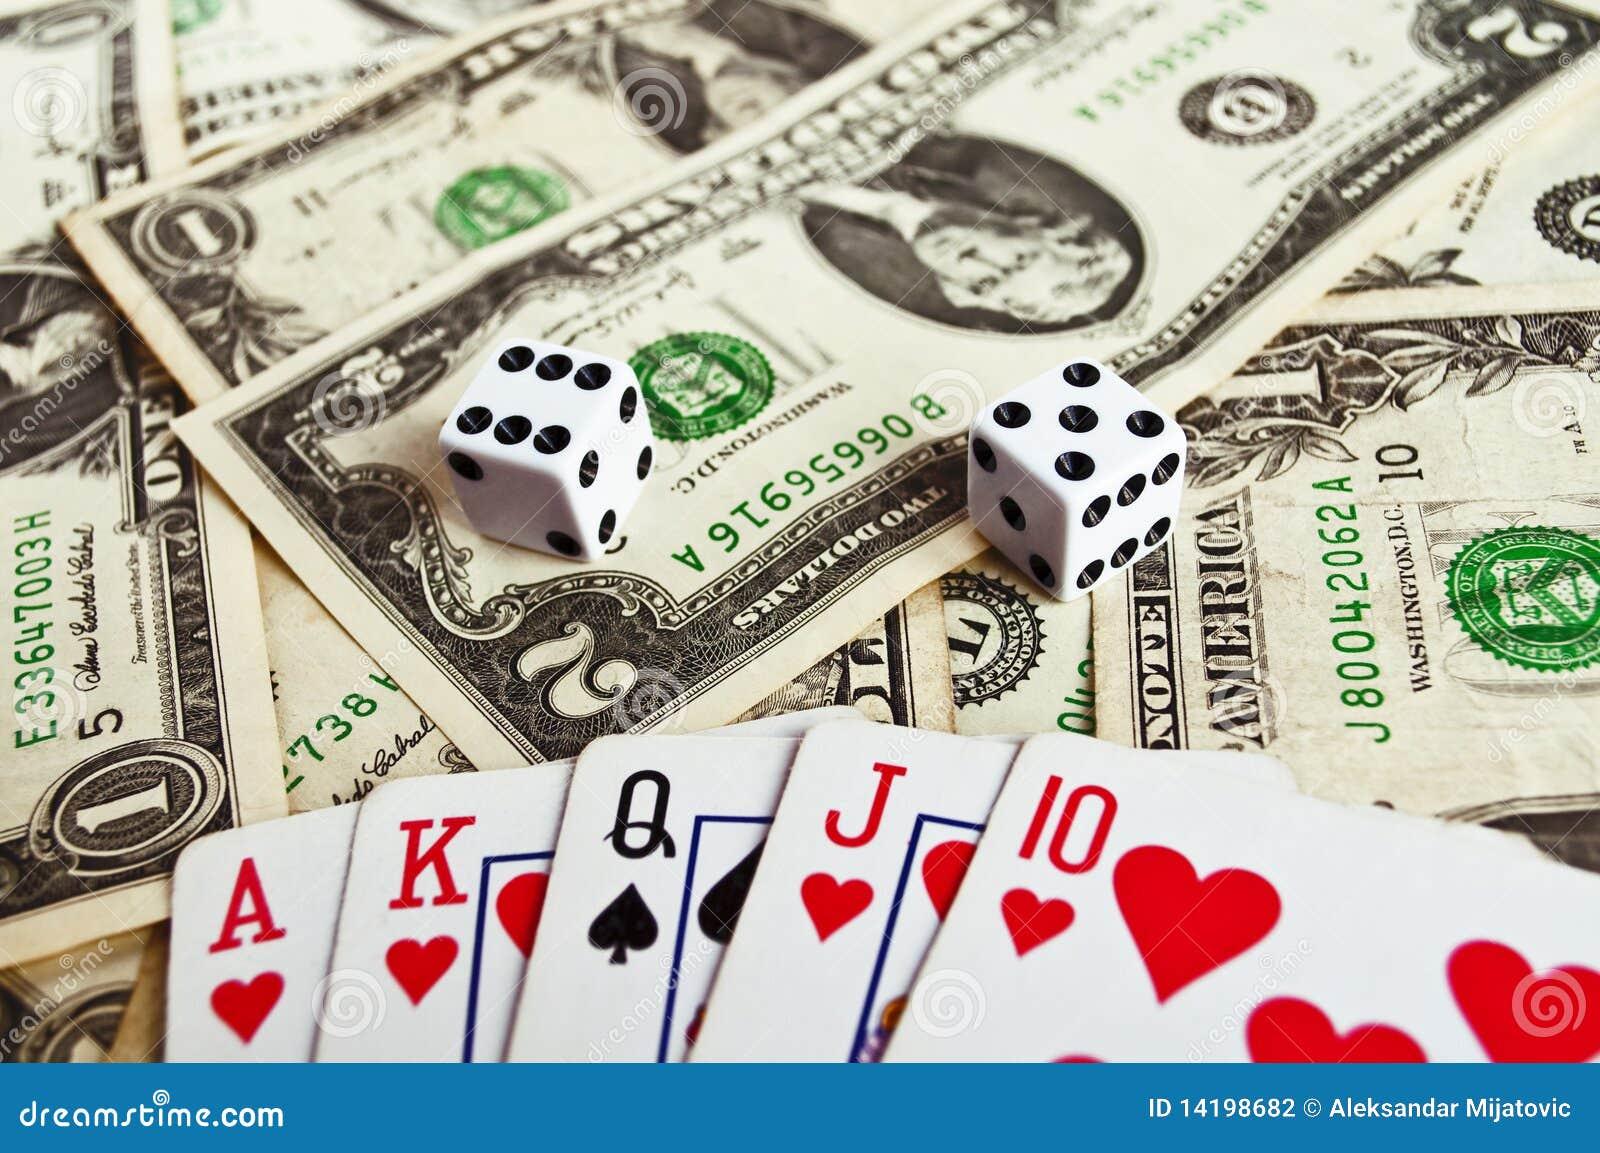 Is poker luck based